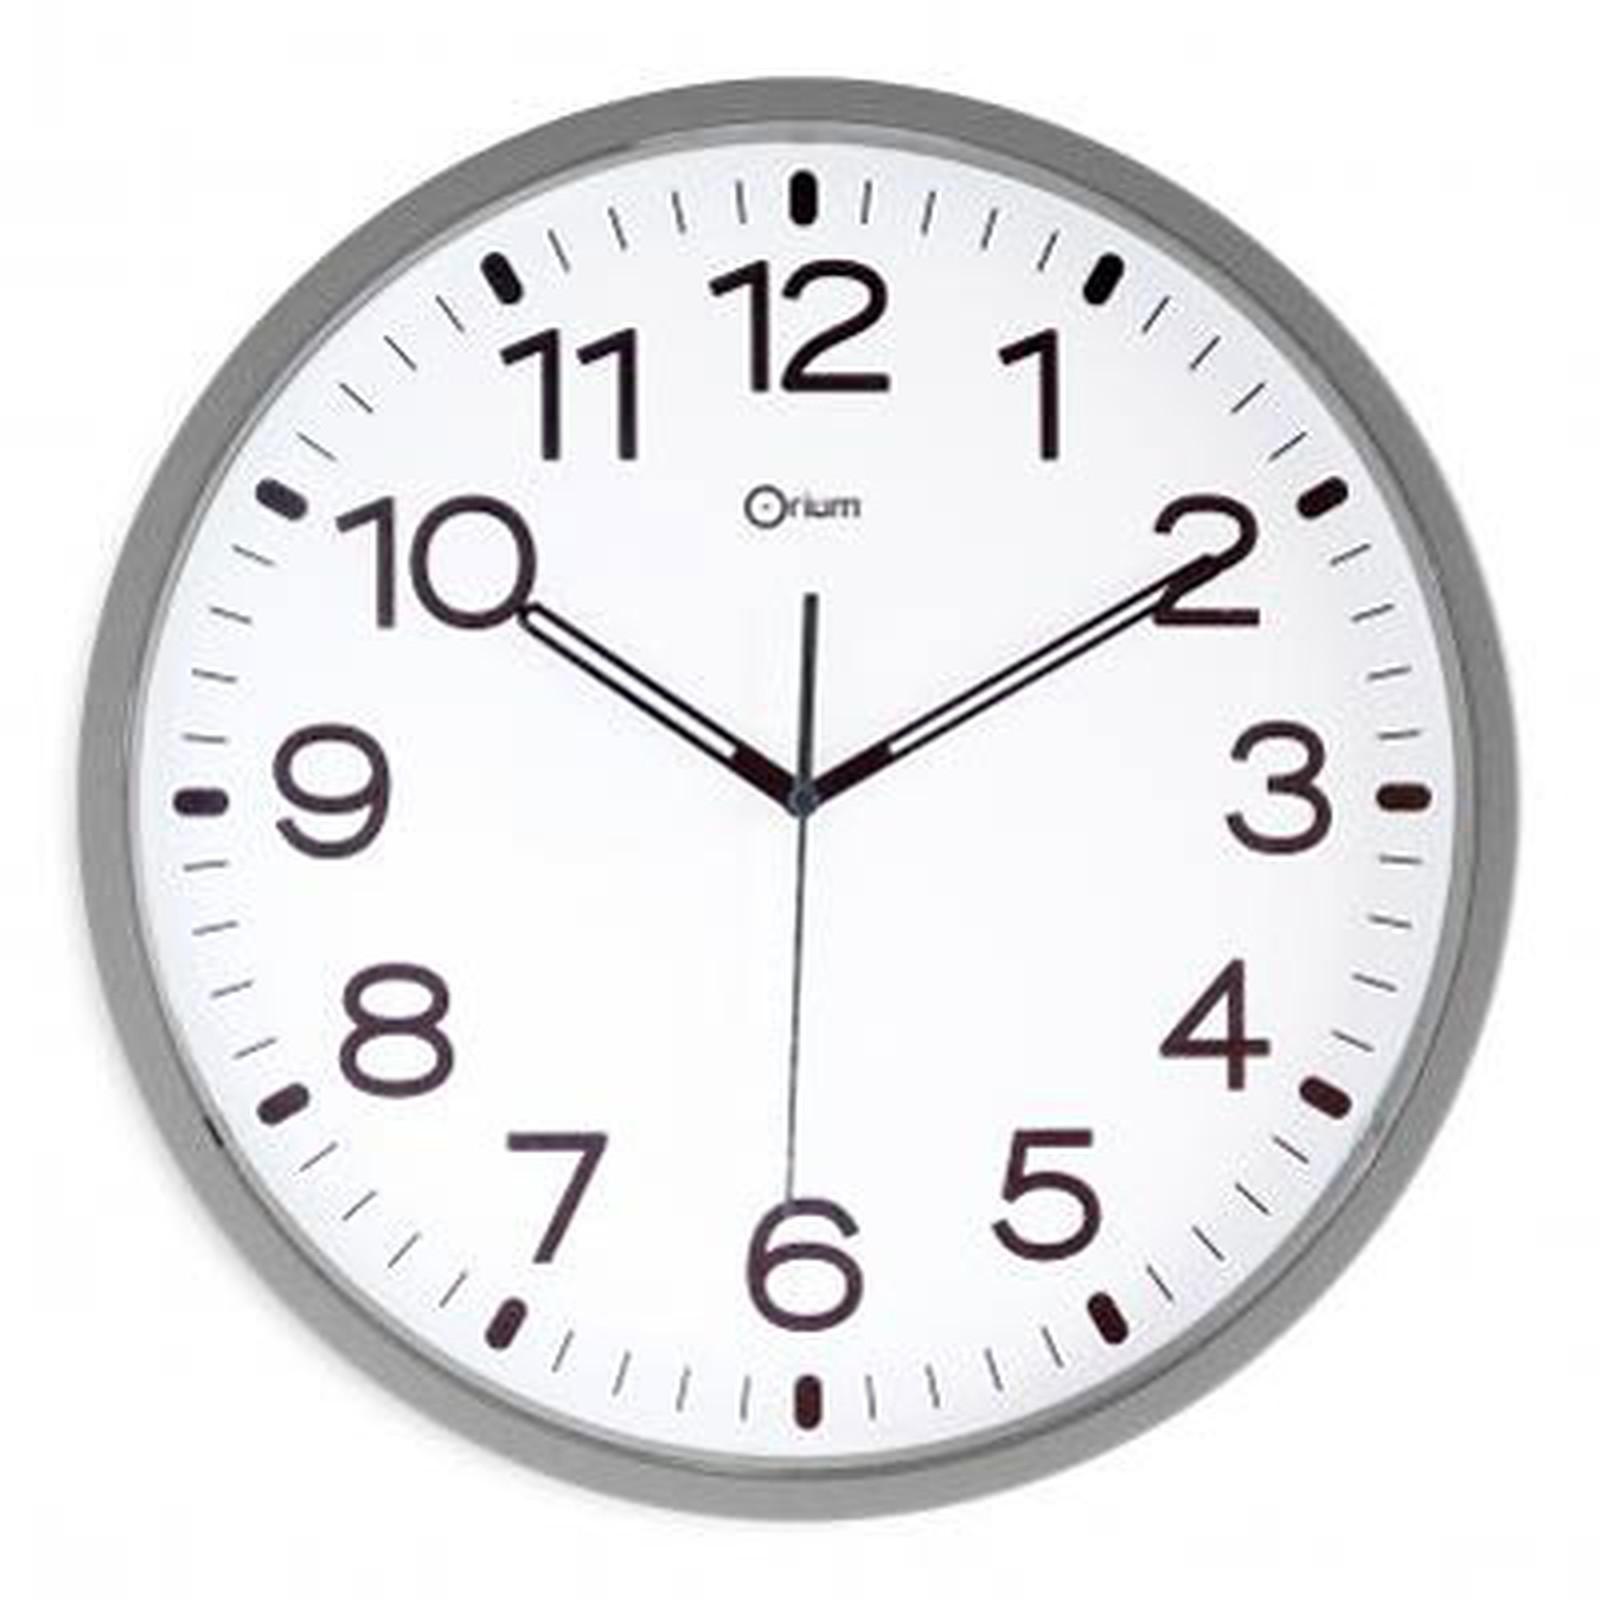 Orium Silent Reloj de pared magnético Silver